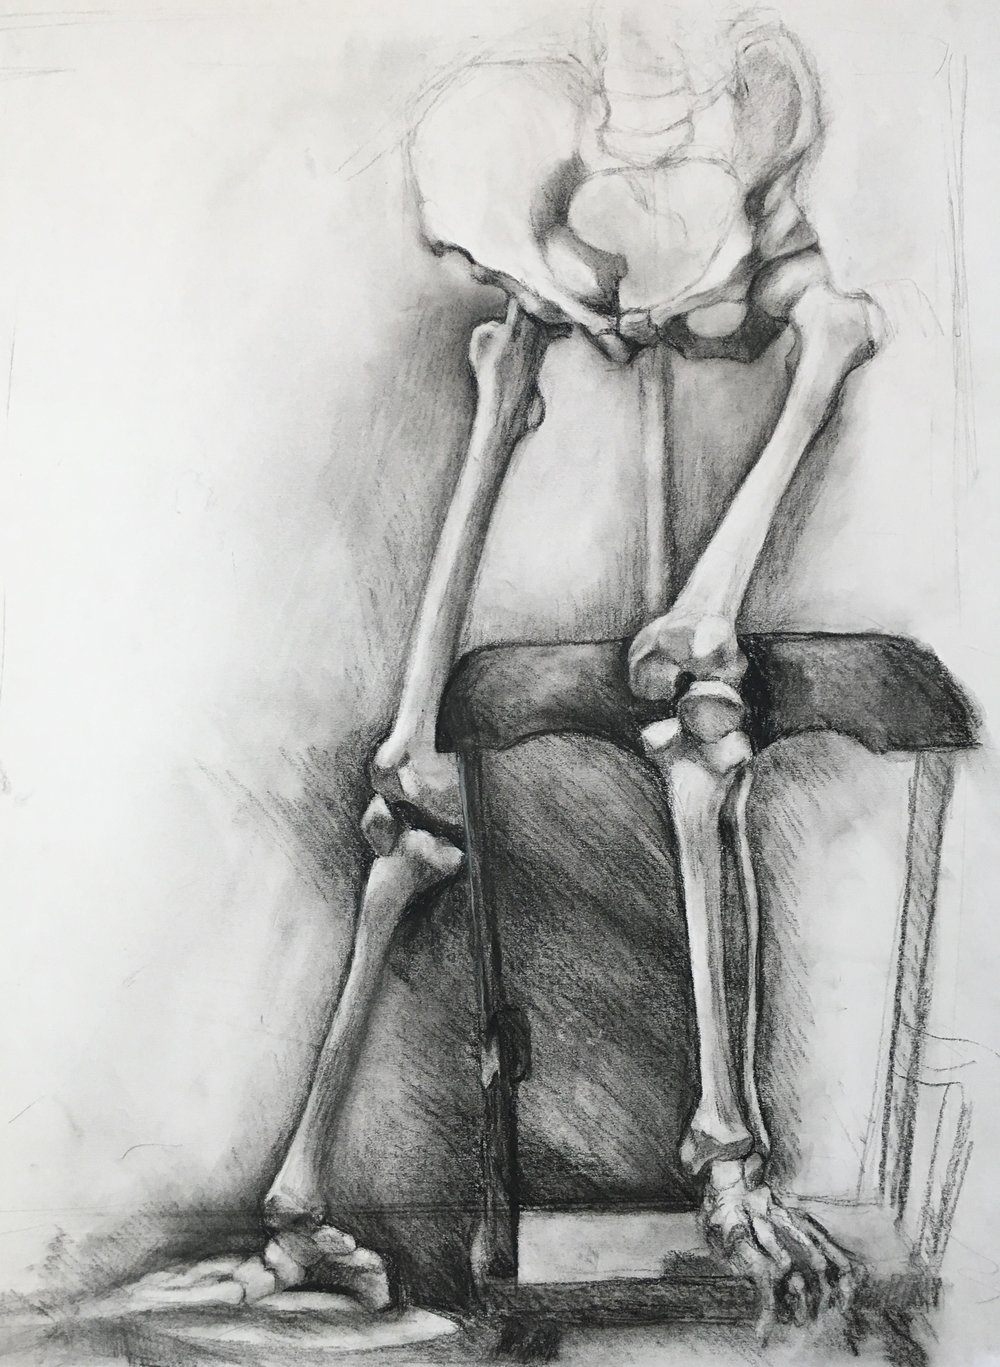 Skeleton Study - Lower Body